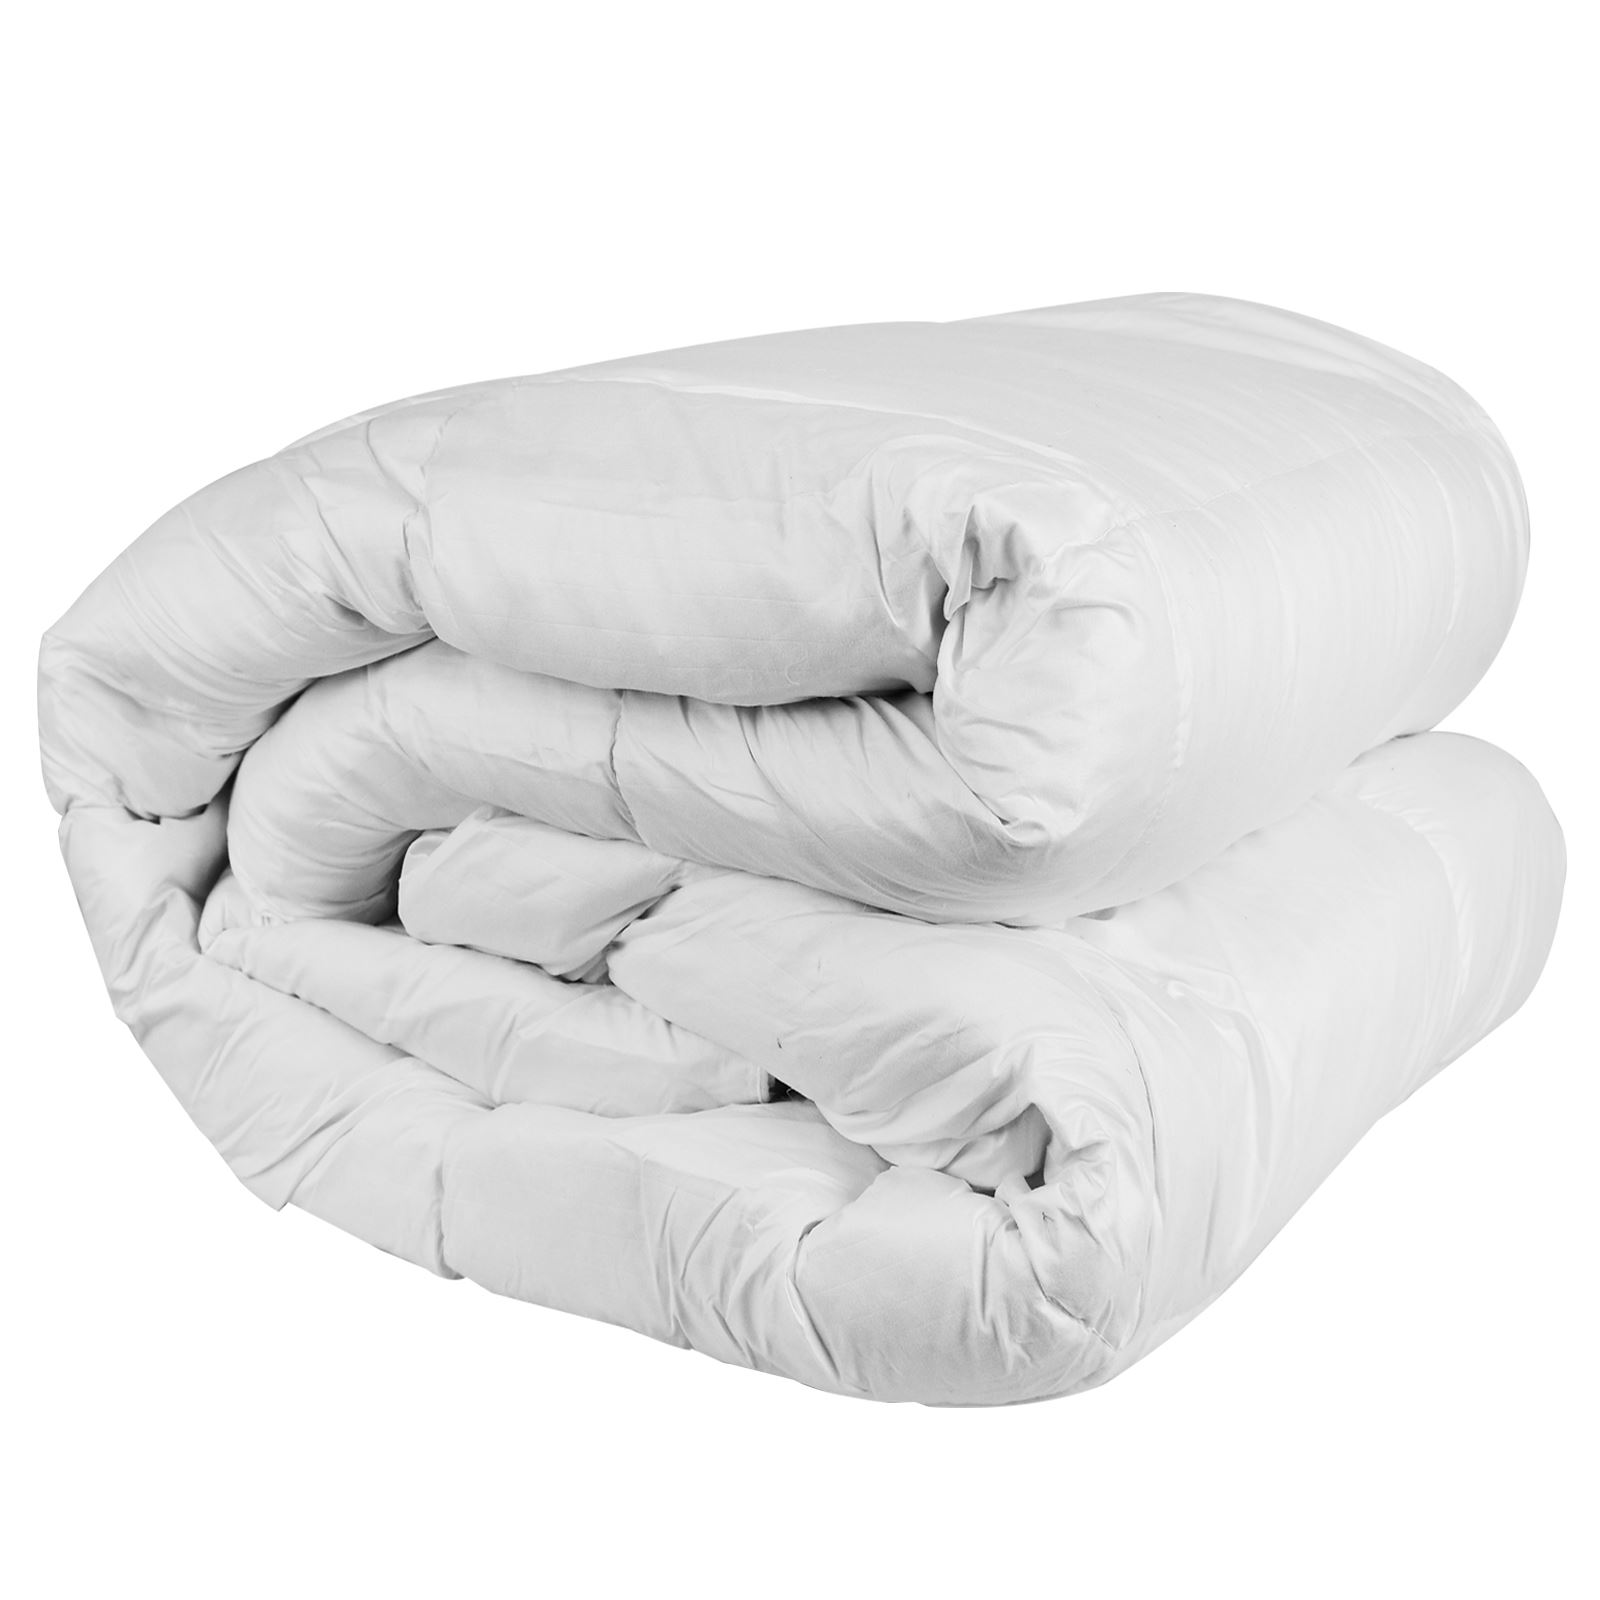 Lujo-Pluma-De-Pato-Abajo-Edredon-Ropa-De-Cama-Edredon-relleno-confortable-13-5-15-Tog miniatura 26